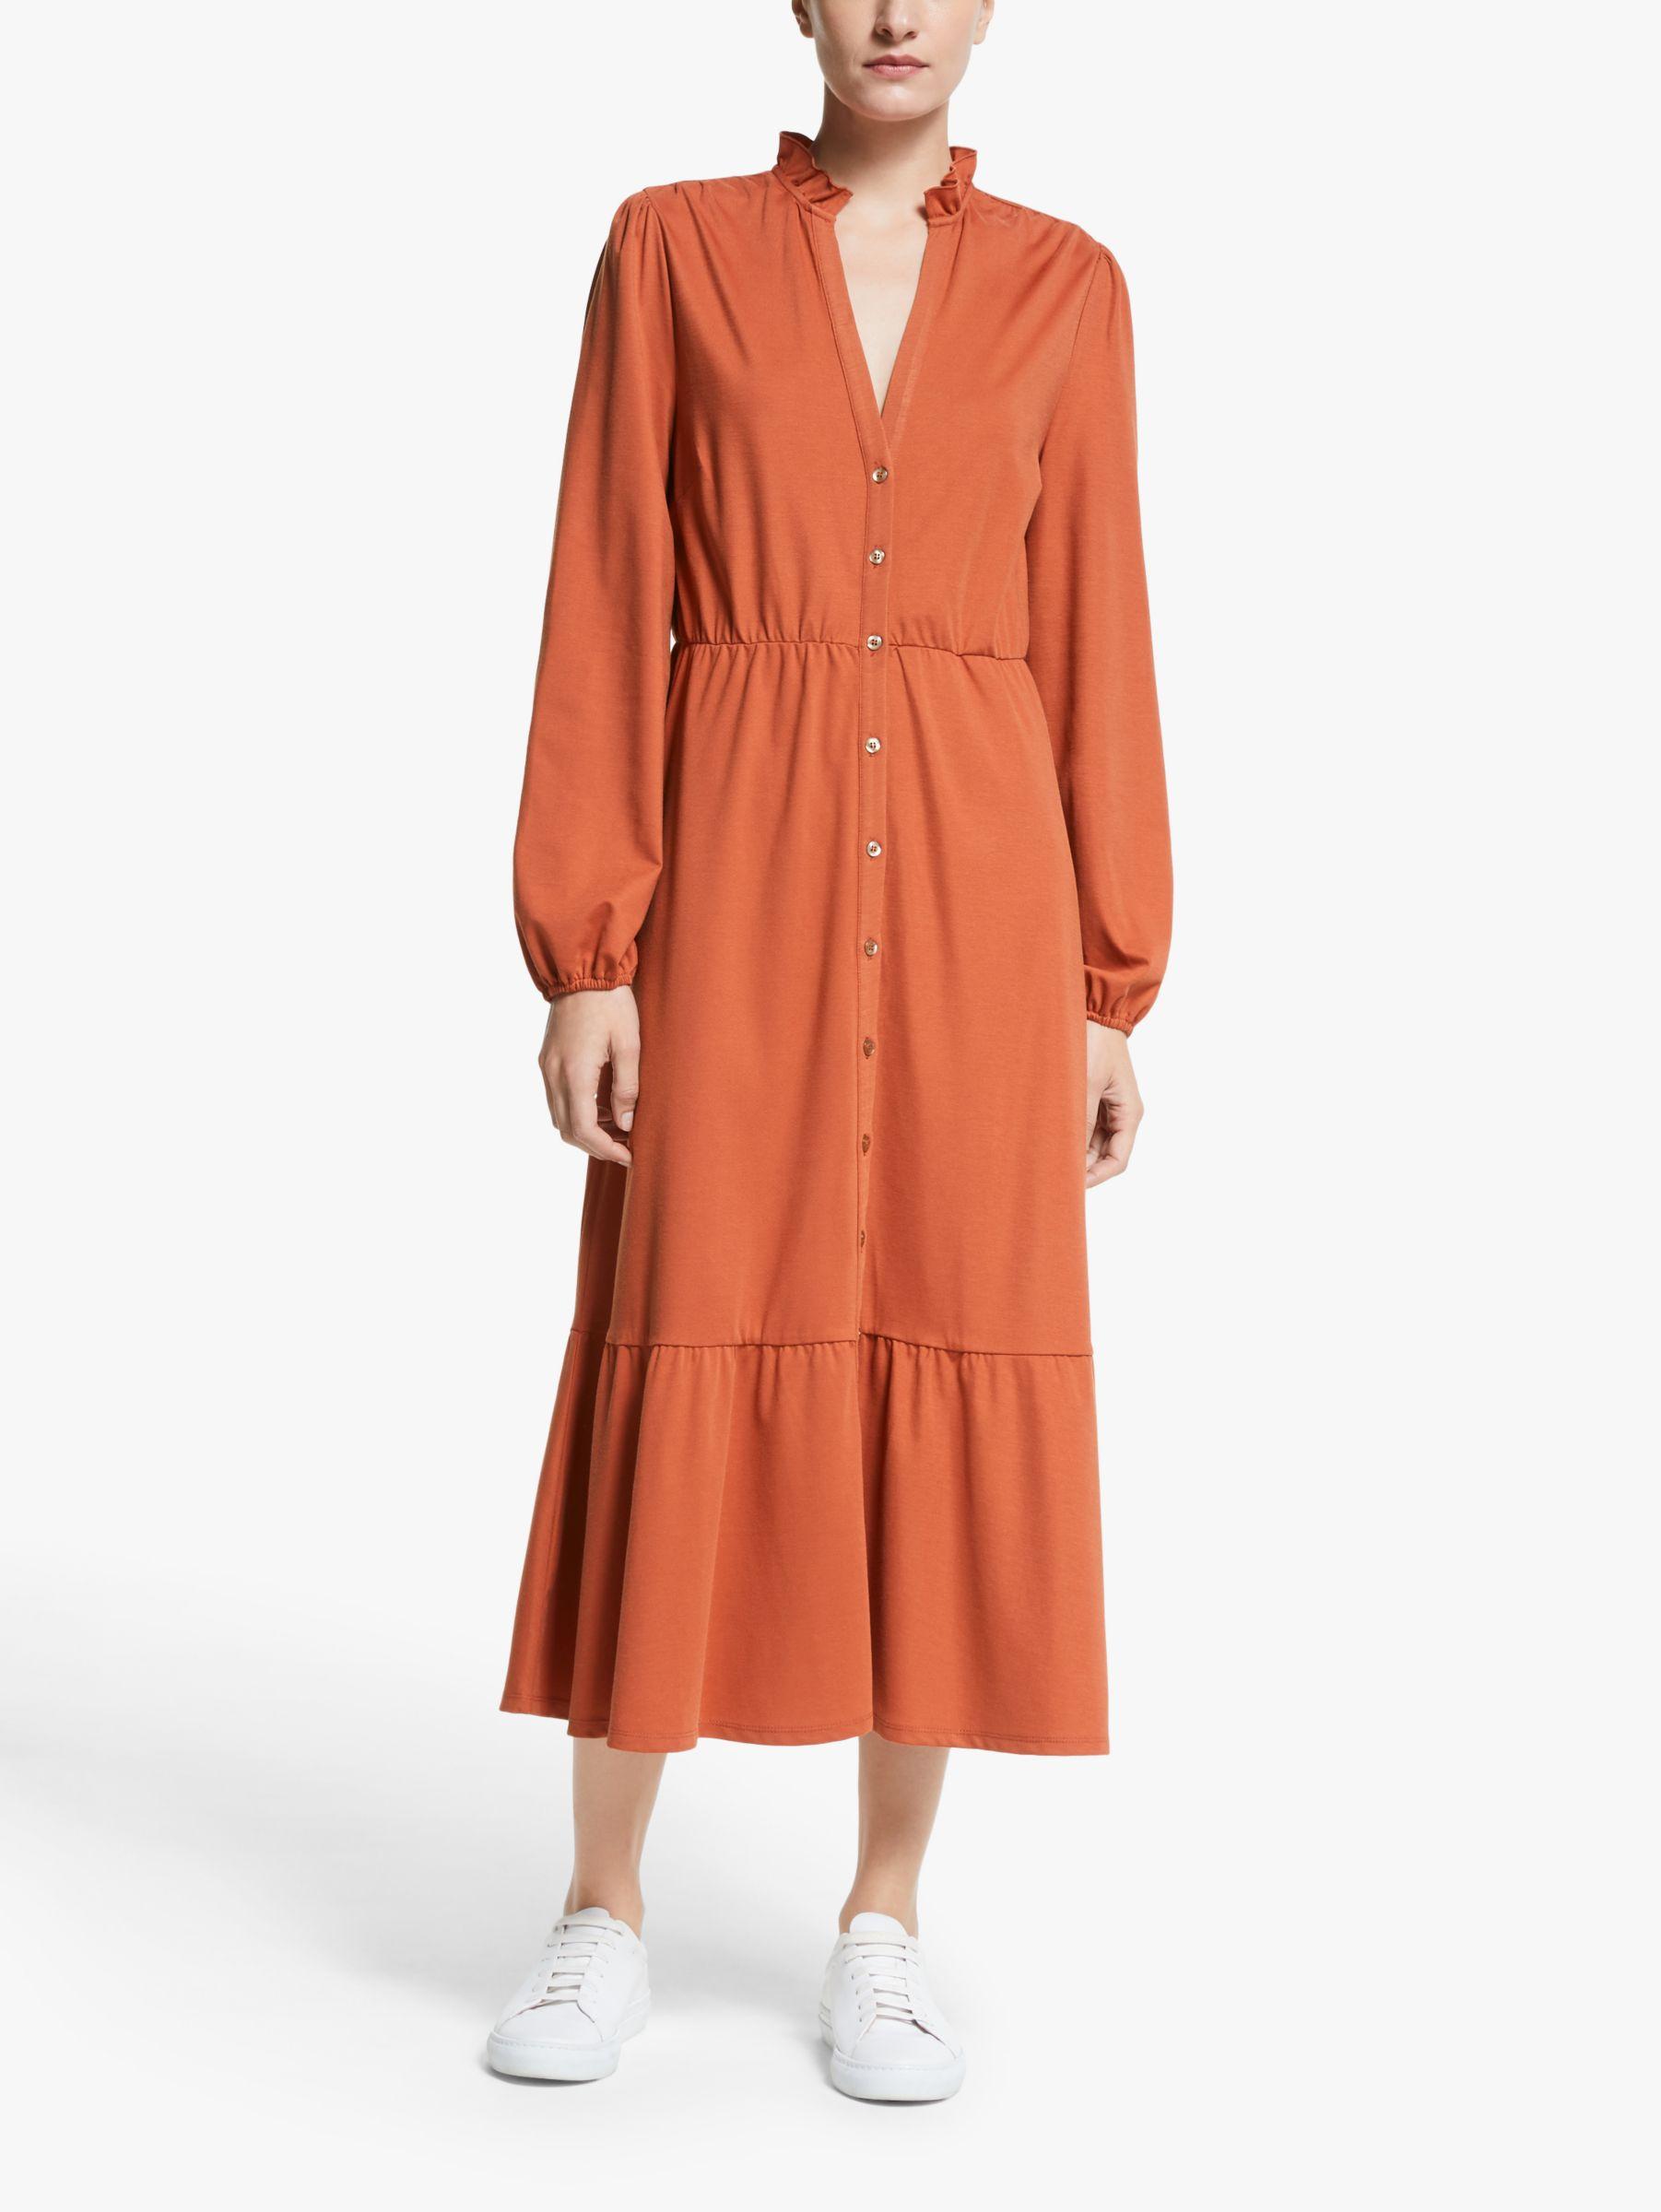 Y.a.s Y.A.S Dune Midi Dress, Orange